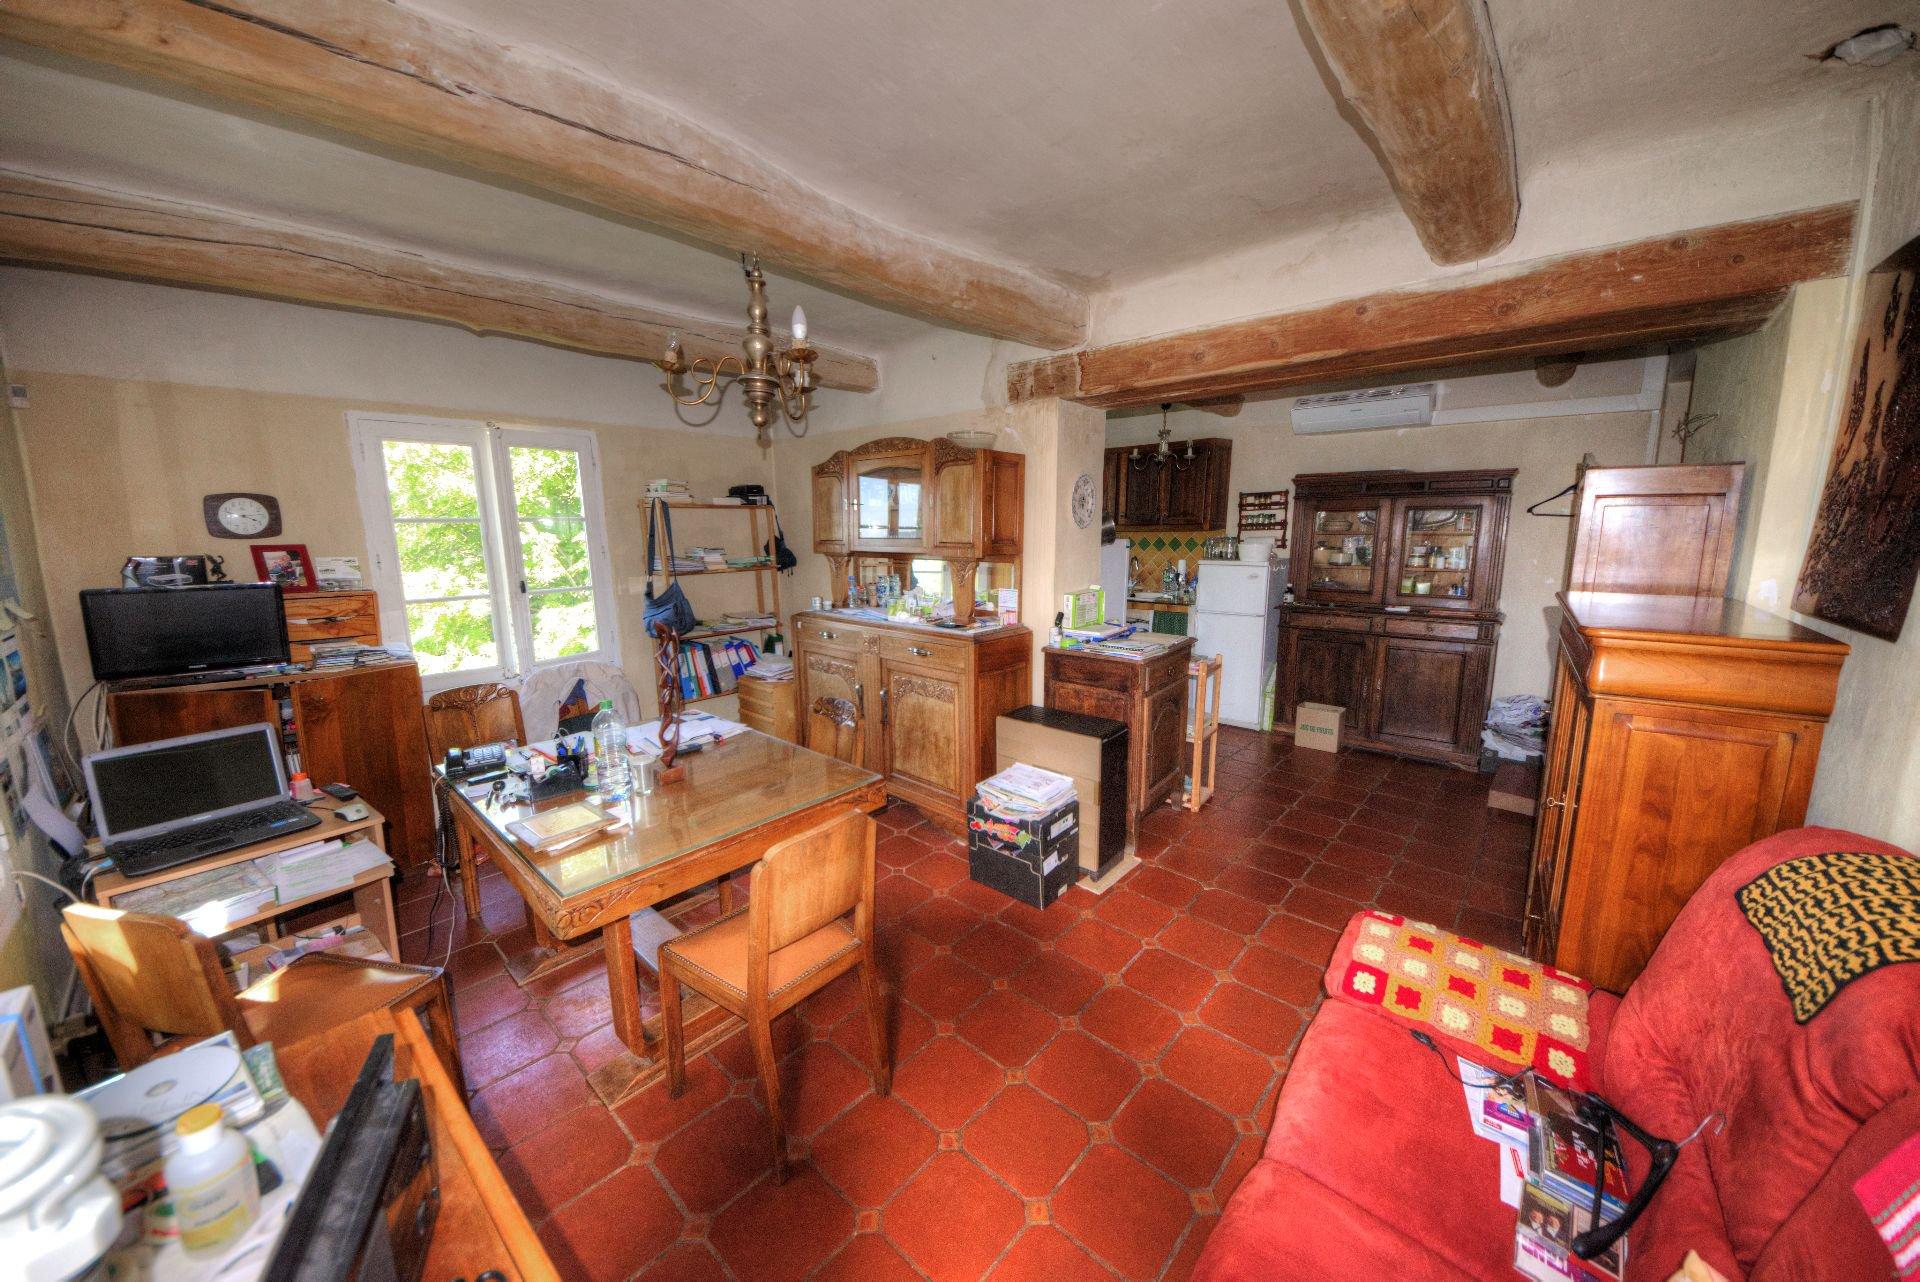 Living room with opened kitchen bastide Villecroze Verdon